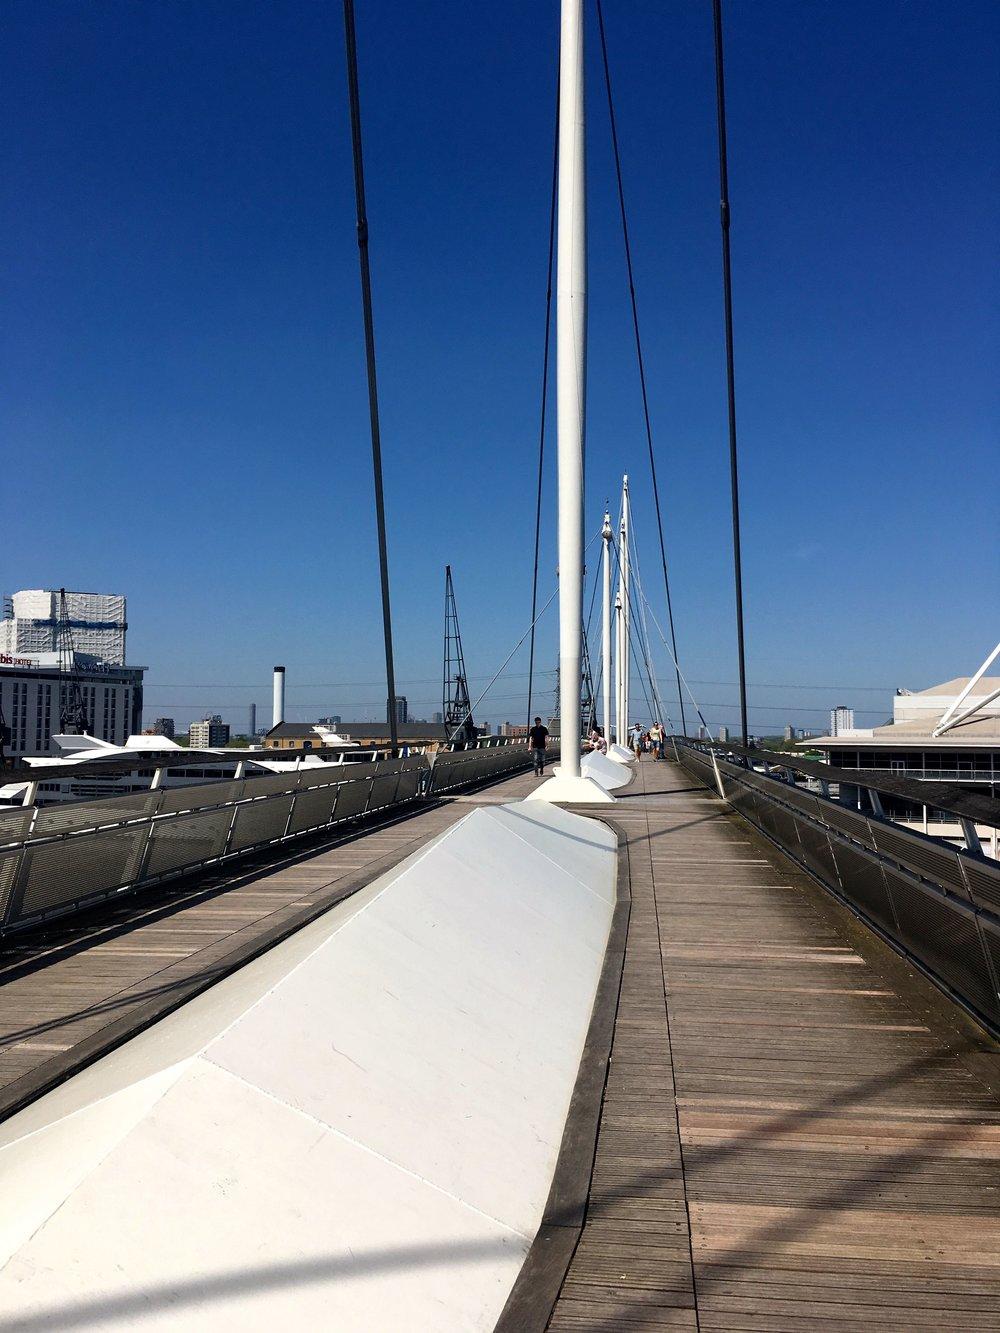 Walking across the bridge to the Excel